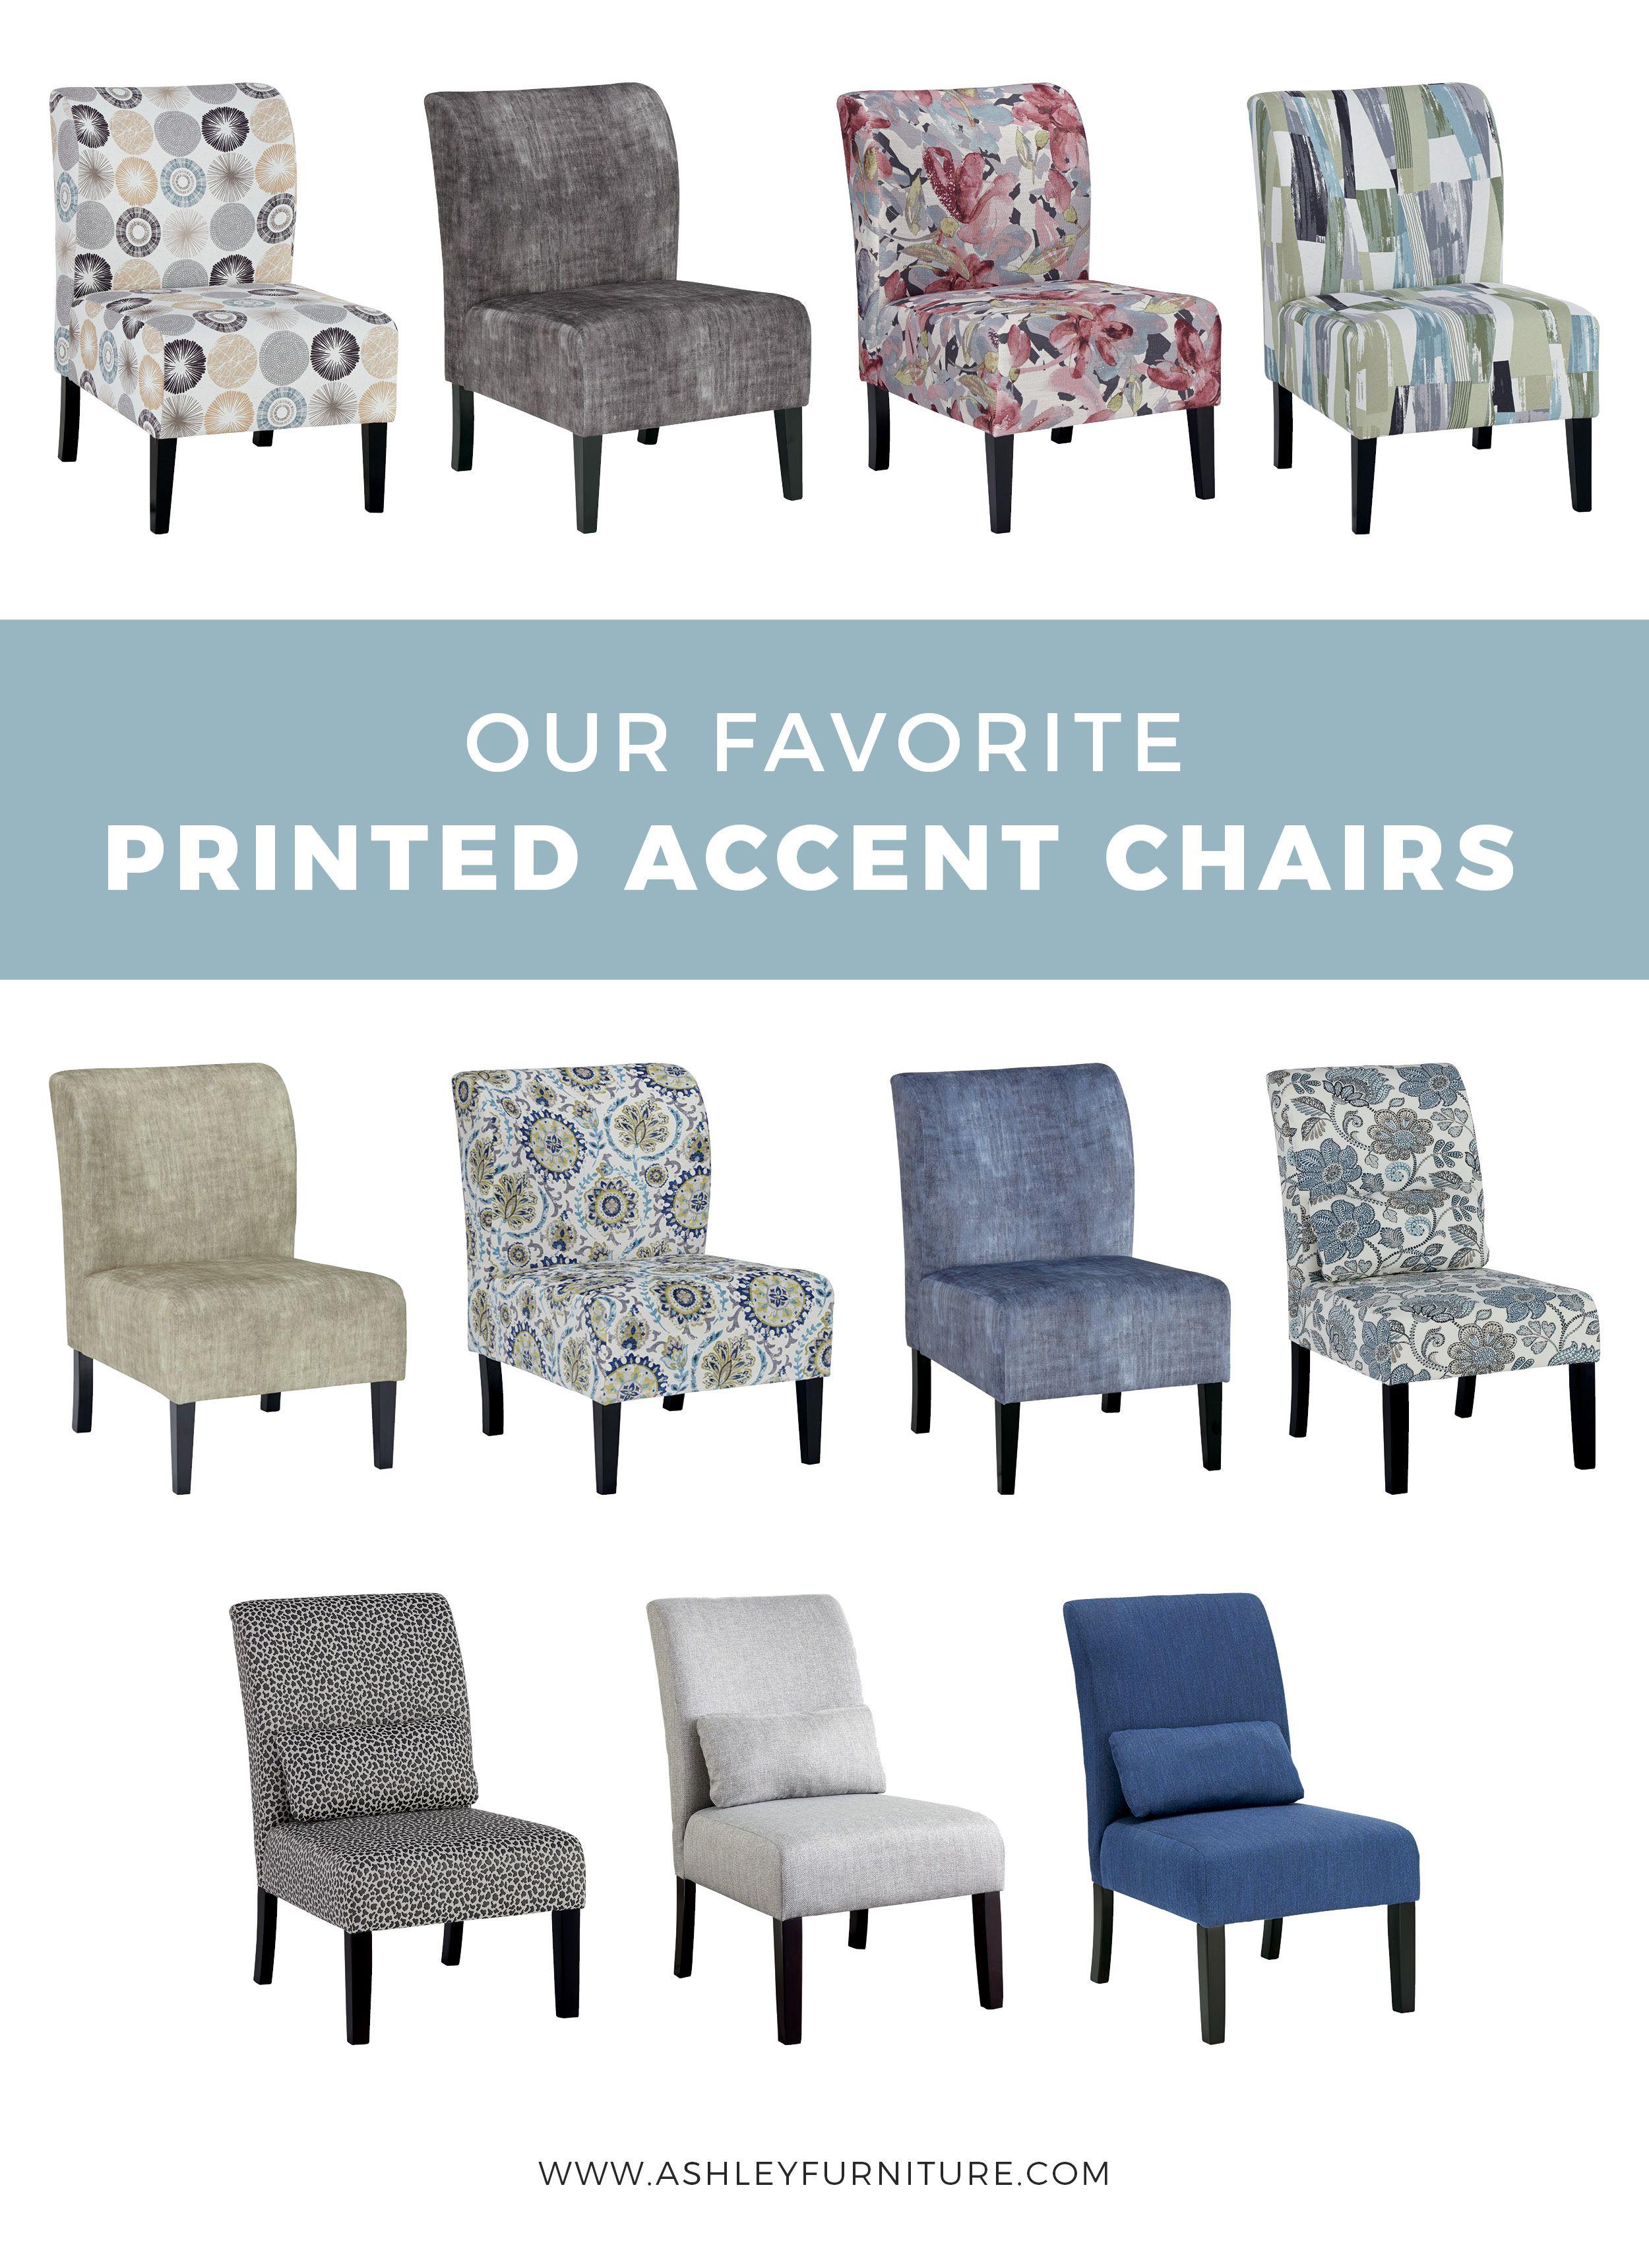 Ashley Furniture Printed Accent Chairs Ashleyfurniture